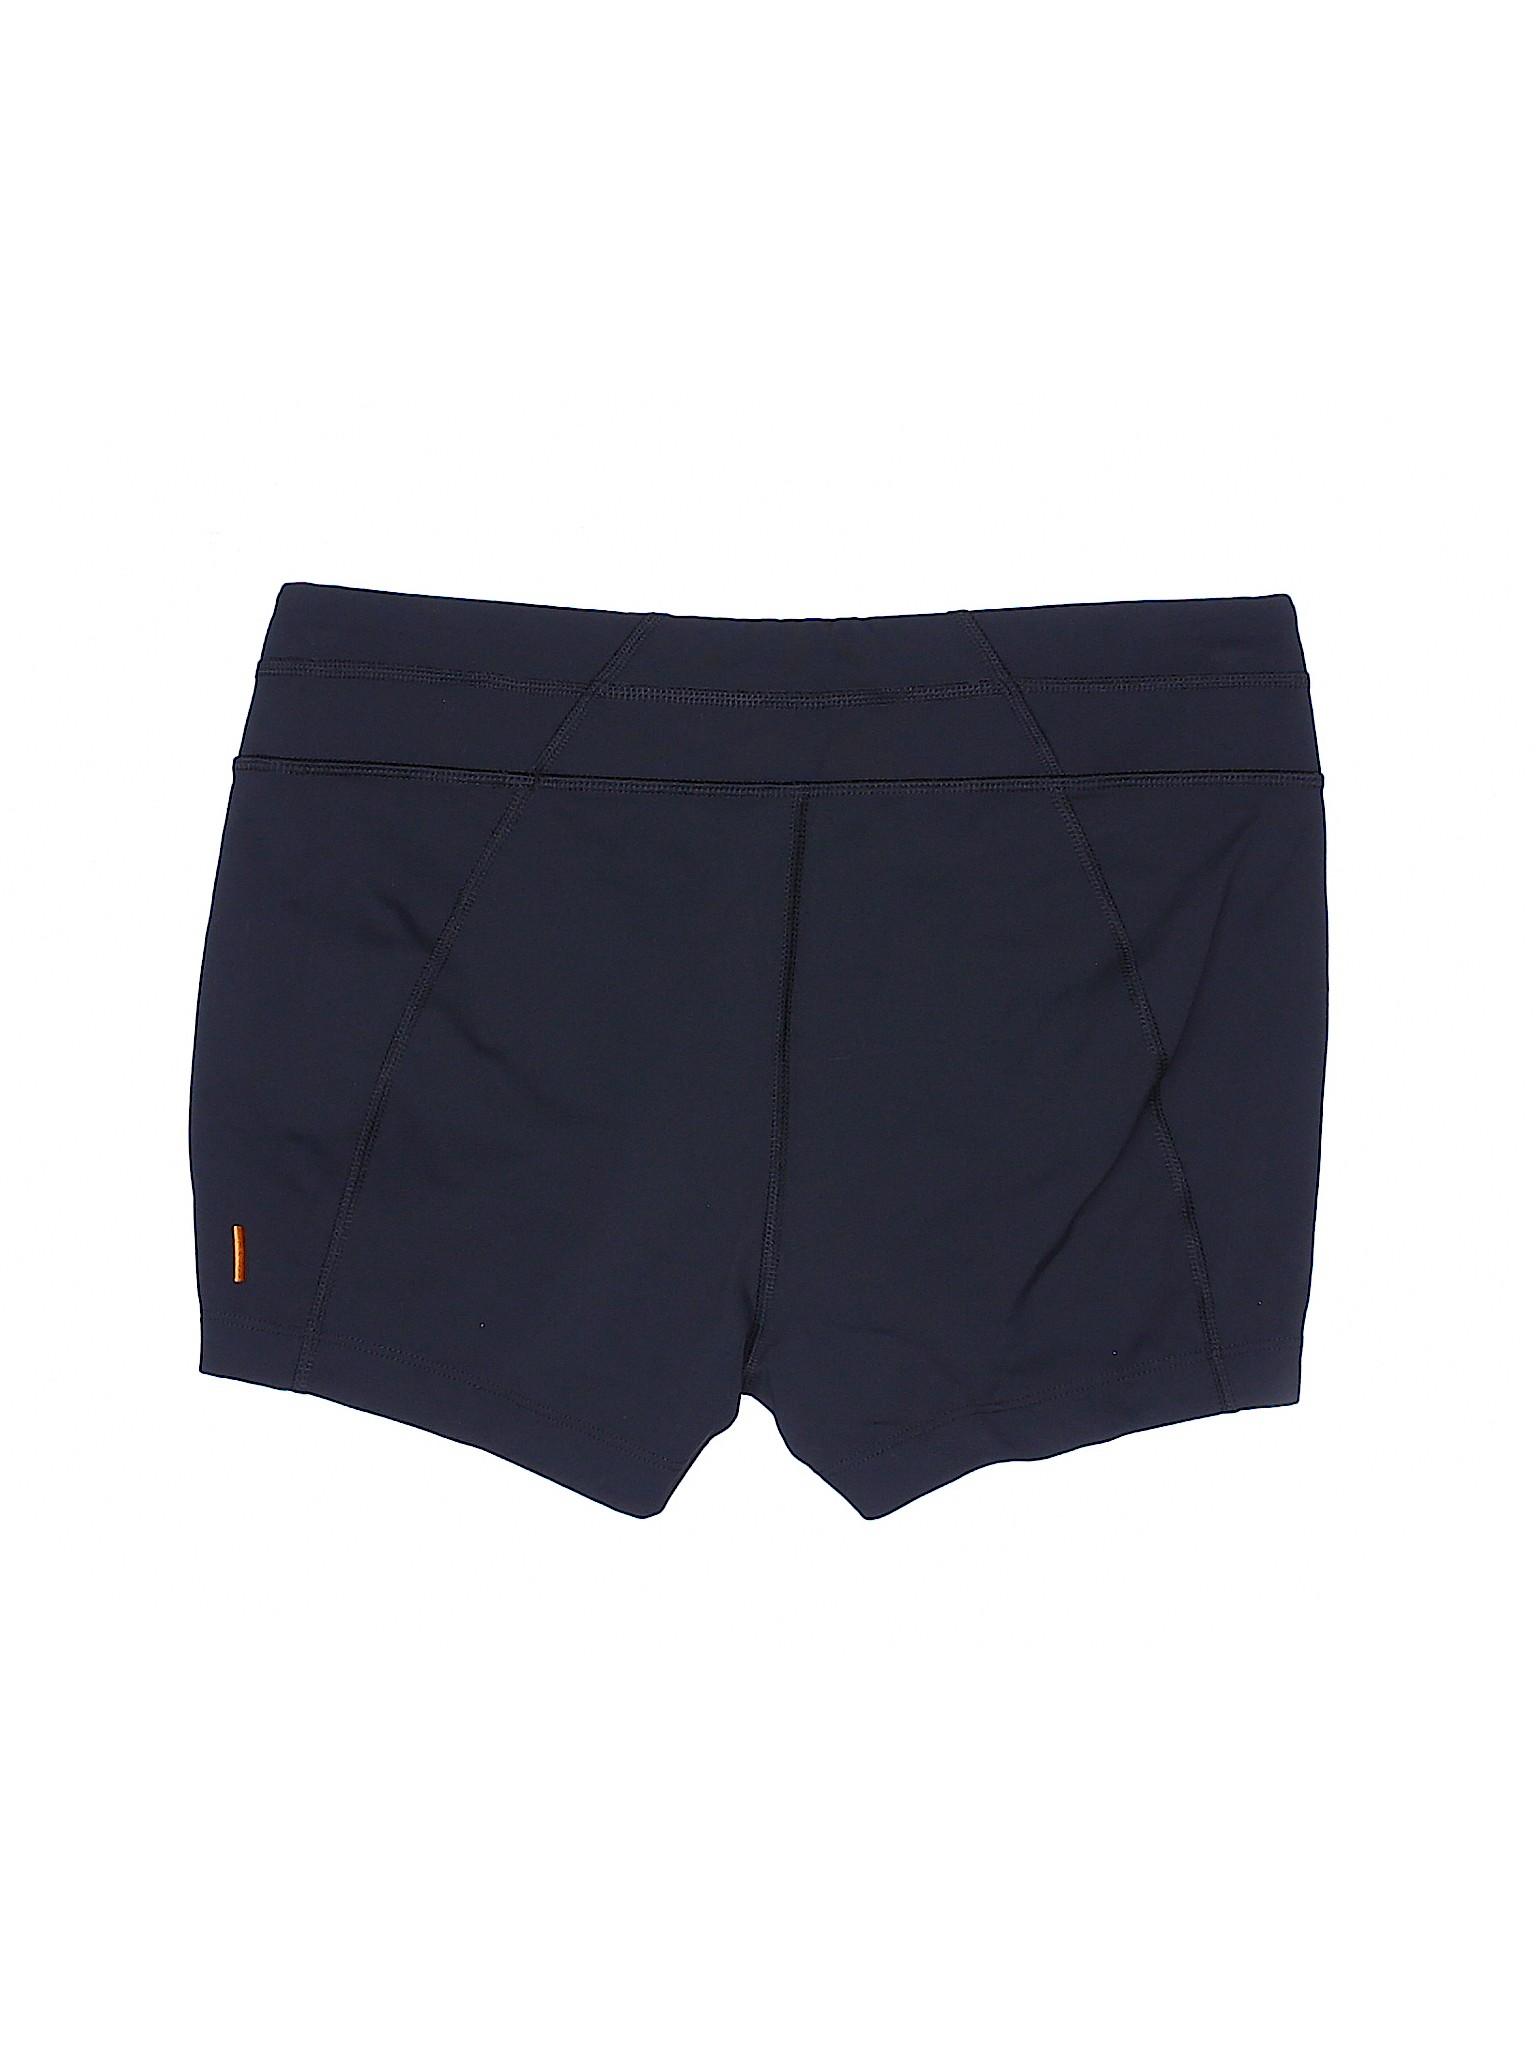 Boutique Shorts lucy Athletic Boutique lucy 6nFwZR4q